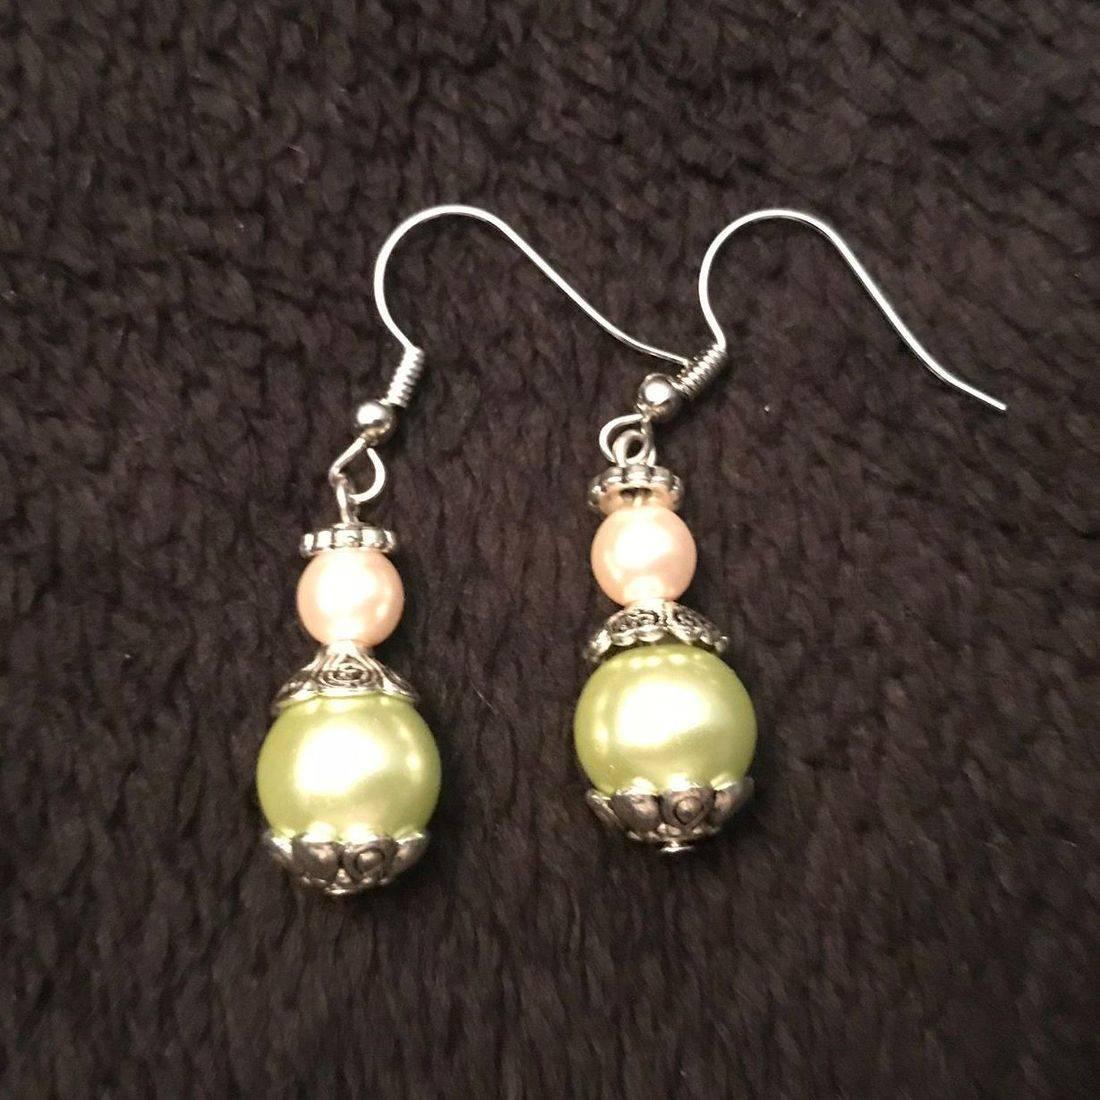 Pink & Seafoam Pearl Earrings